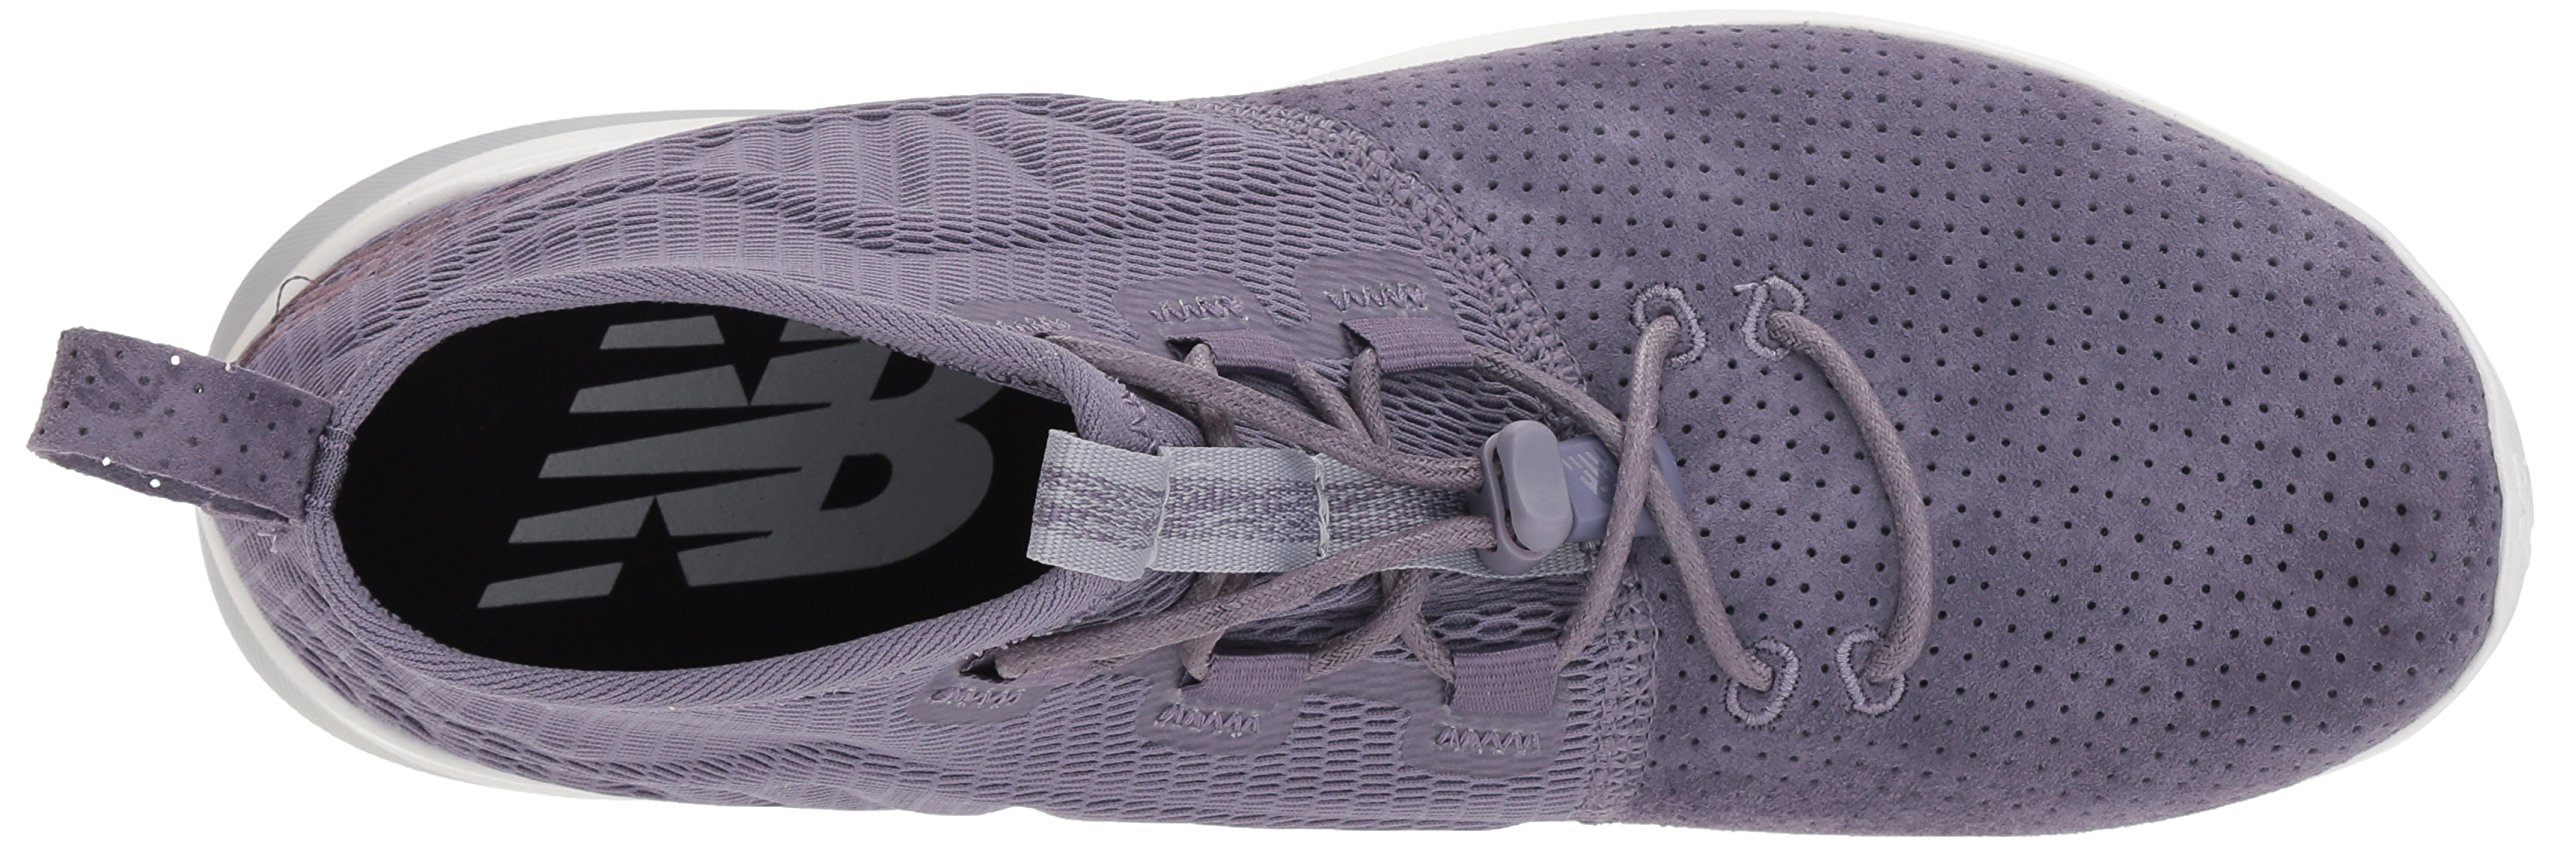 New Balance Women's Cypher Luxe Running Shoes